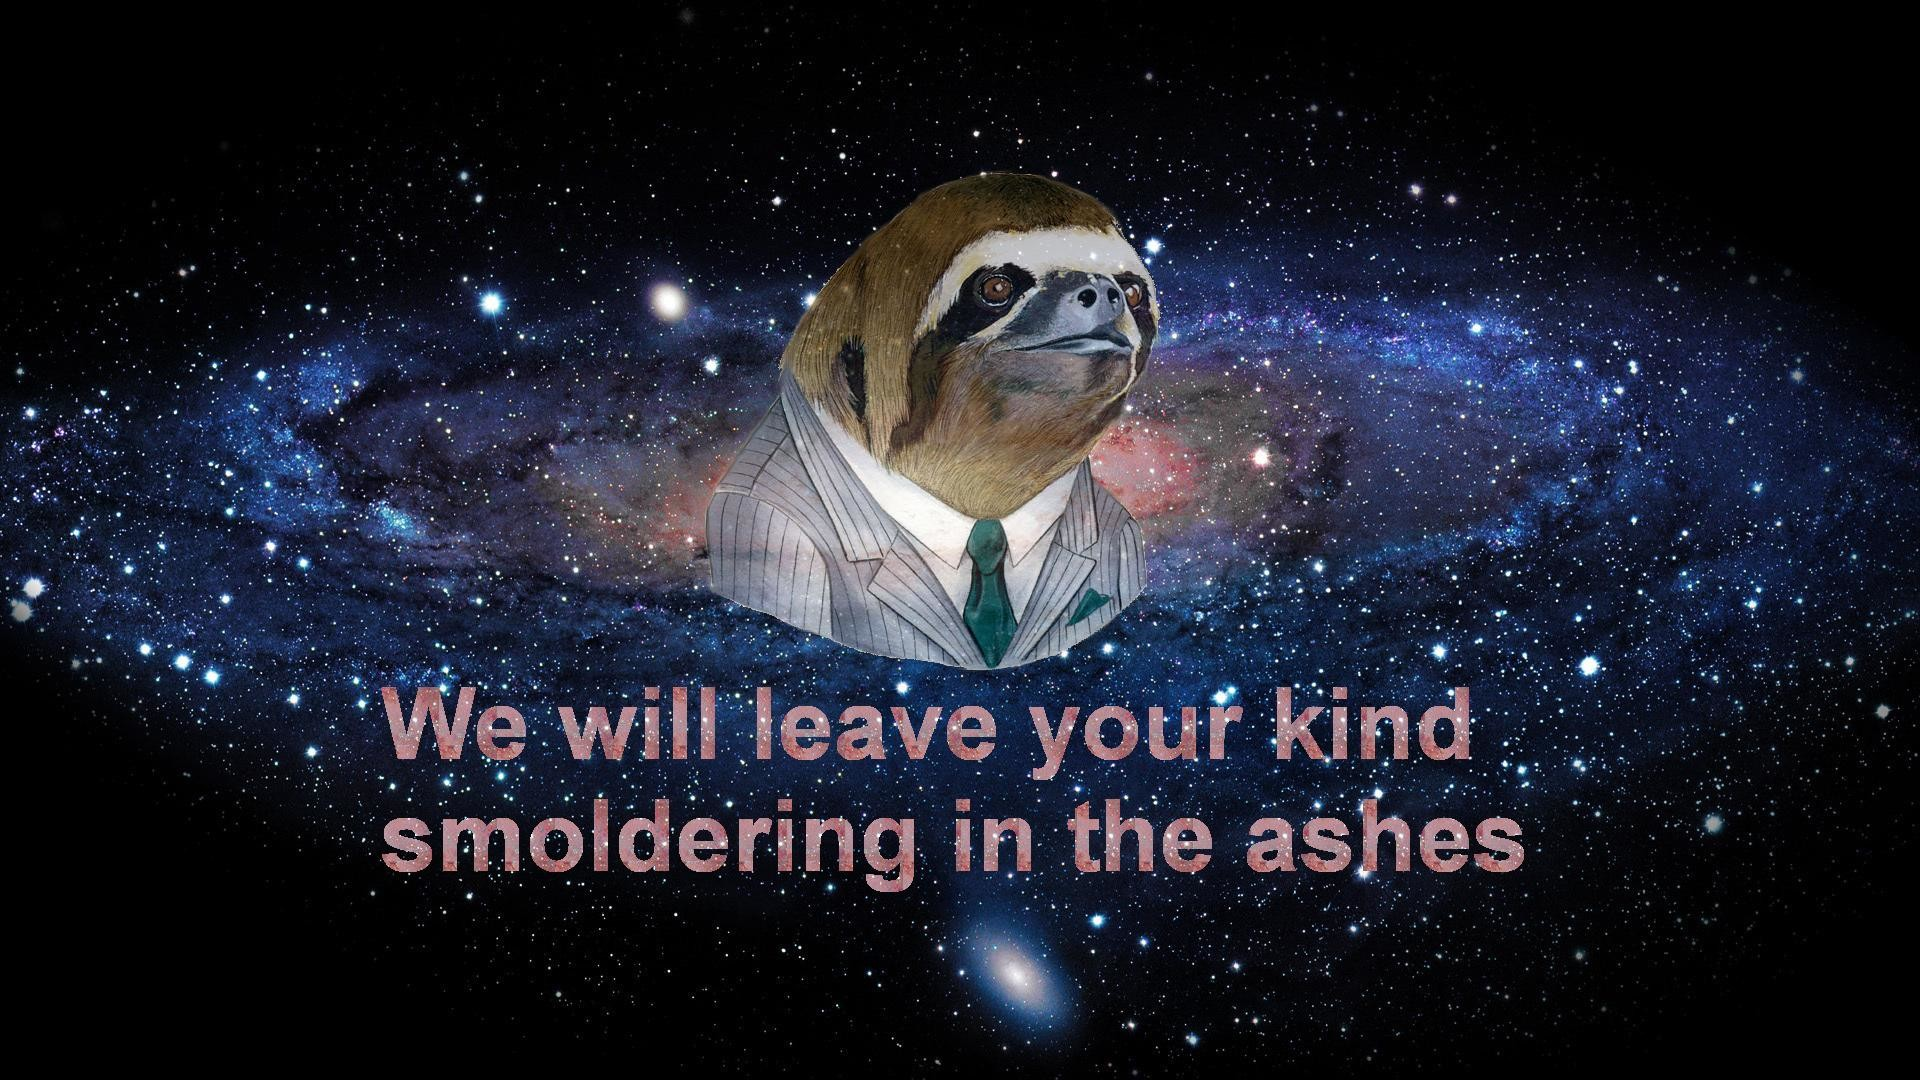 sloth wallpaper 3 | Sloths | Know Your Meme